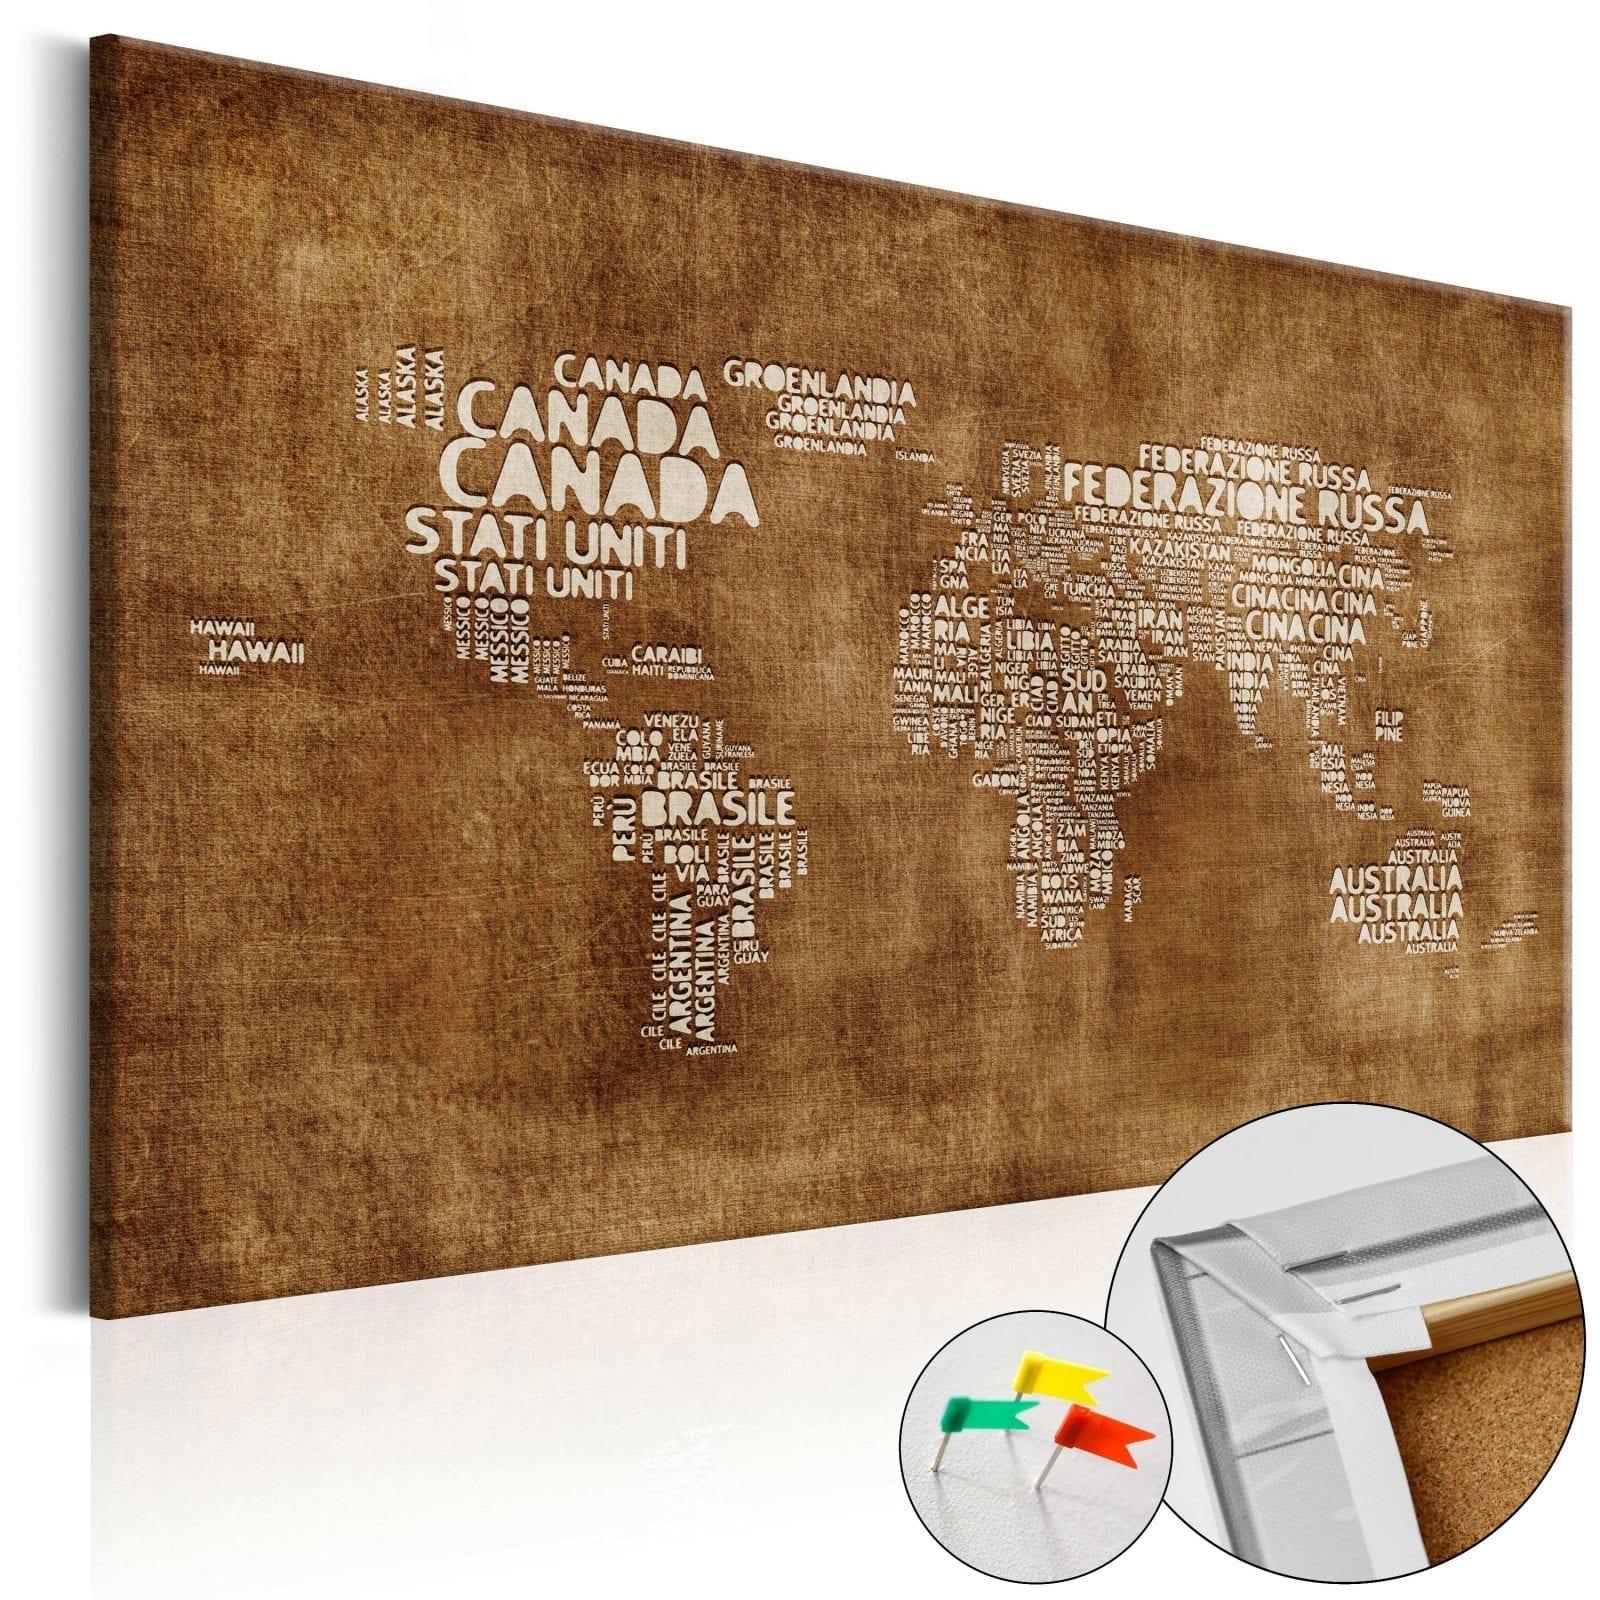 Tablero de corcho - The Lost Map (IT) 1 | Potspintura.com